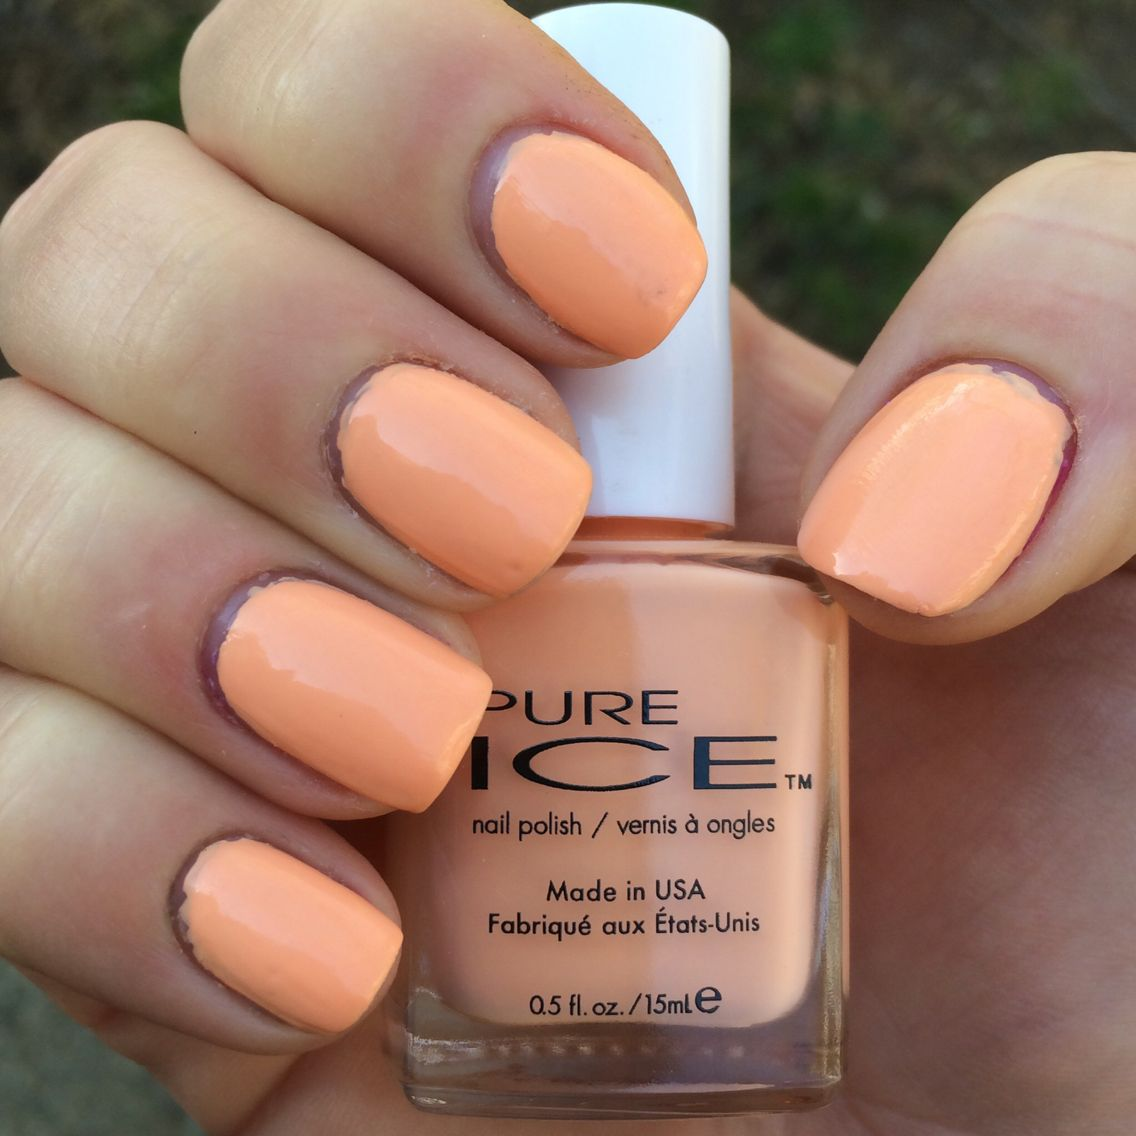 88. Pure Ice: Doll Face #NailSwatch #Nails #NailPolish #PureIce ...